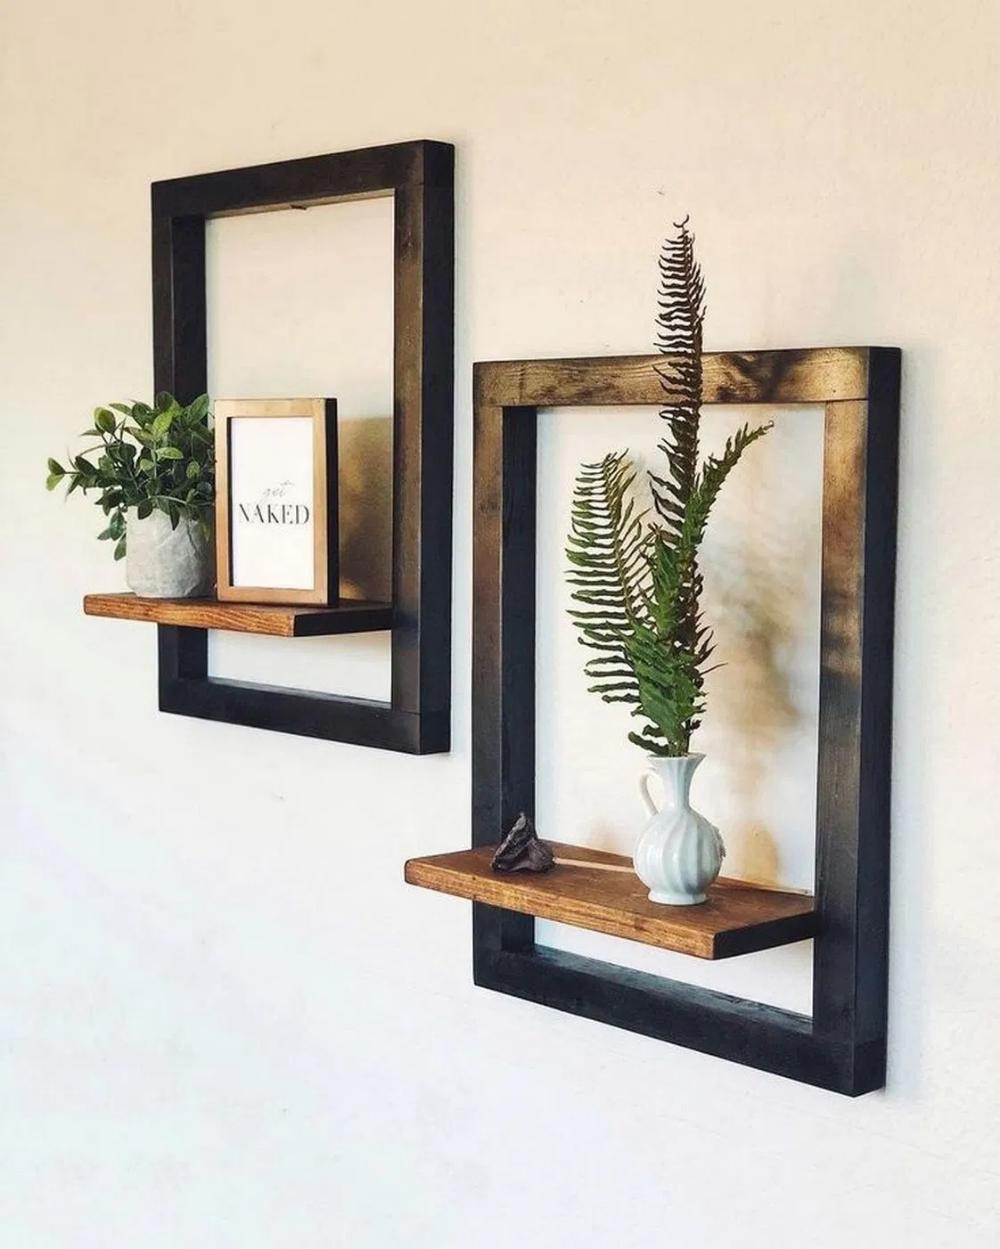 33 Easy Creative Diy Home Decor Ideas On A Budget Tutorial 2 In 2020 Diy Furniture Redo Modern Floating Shelves Decor